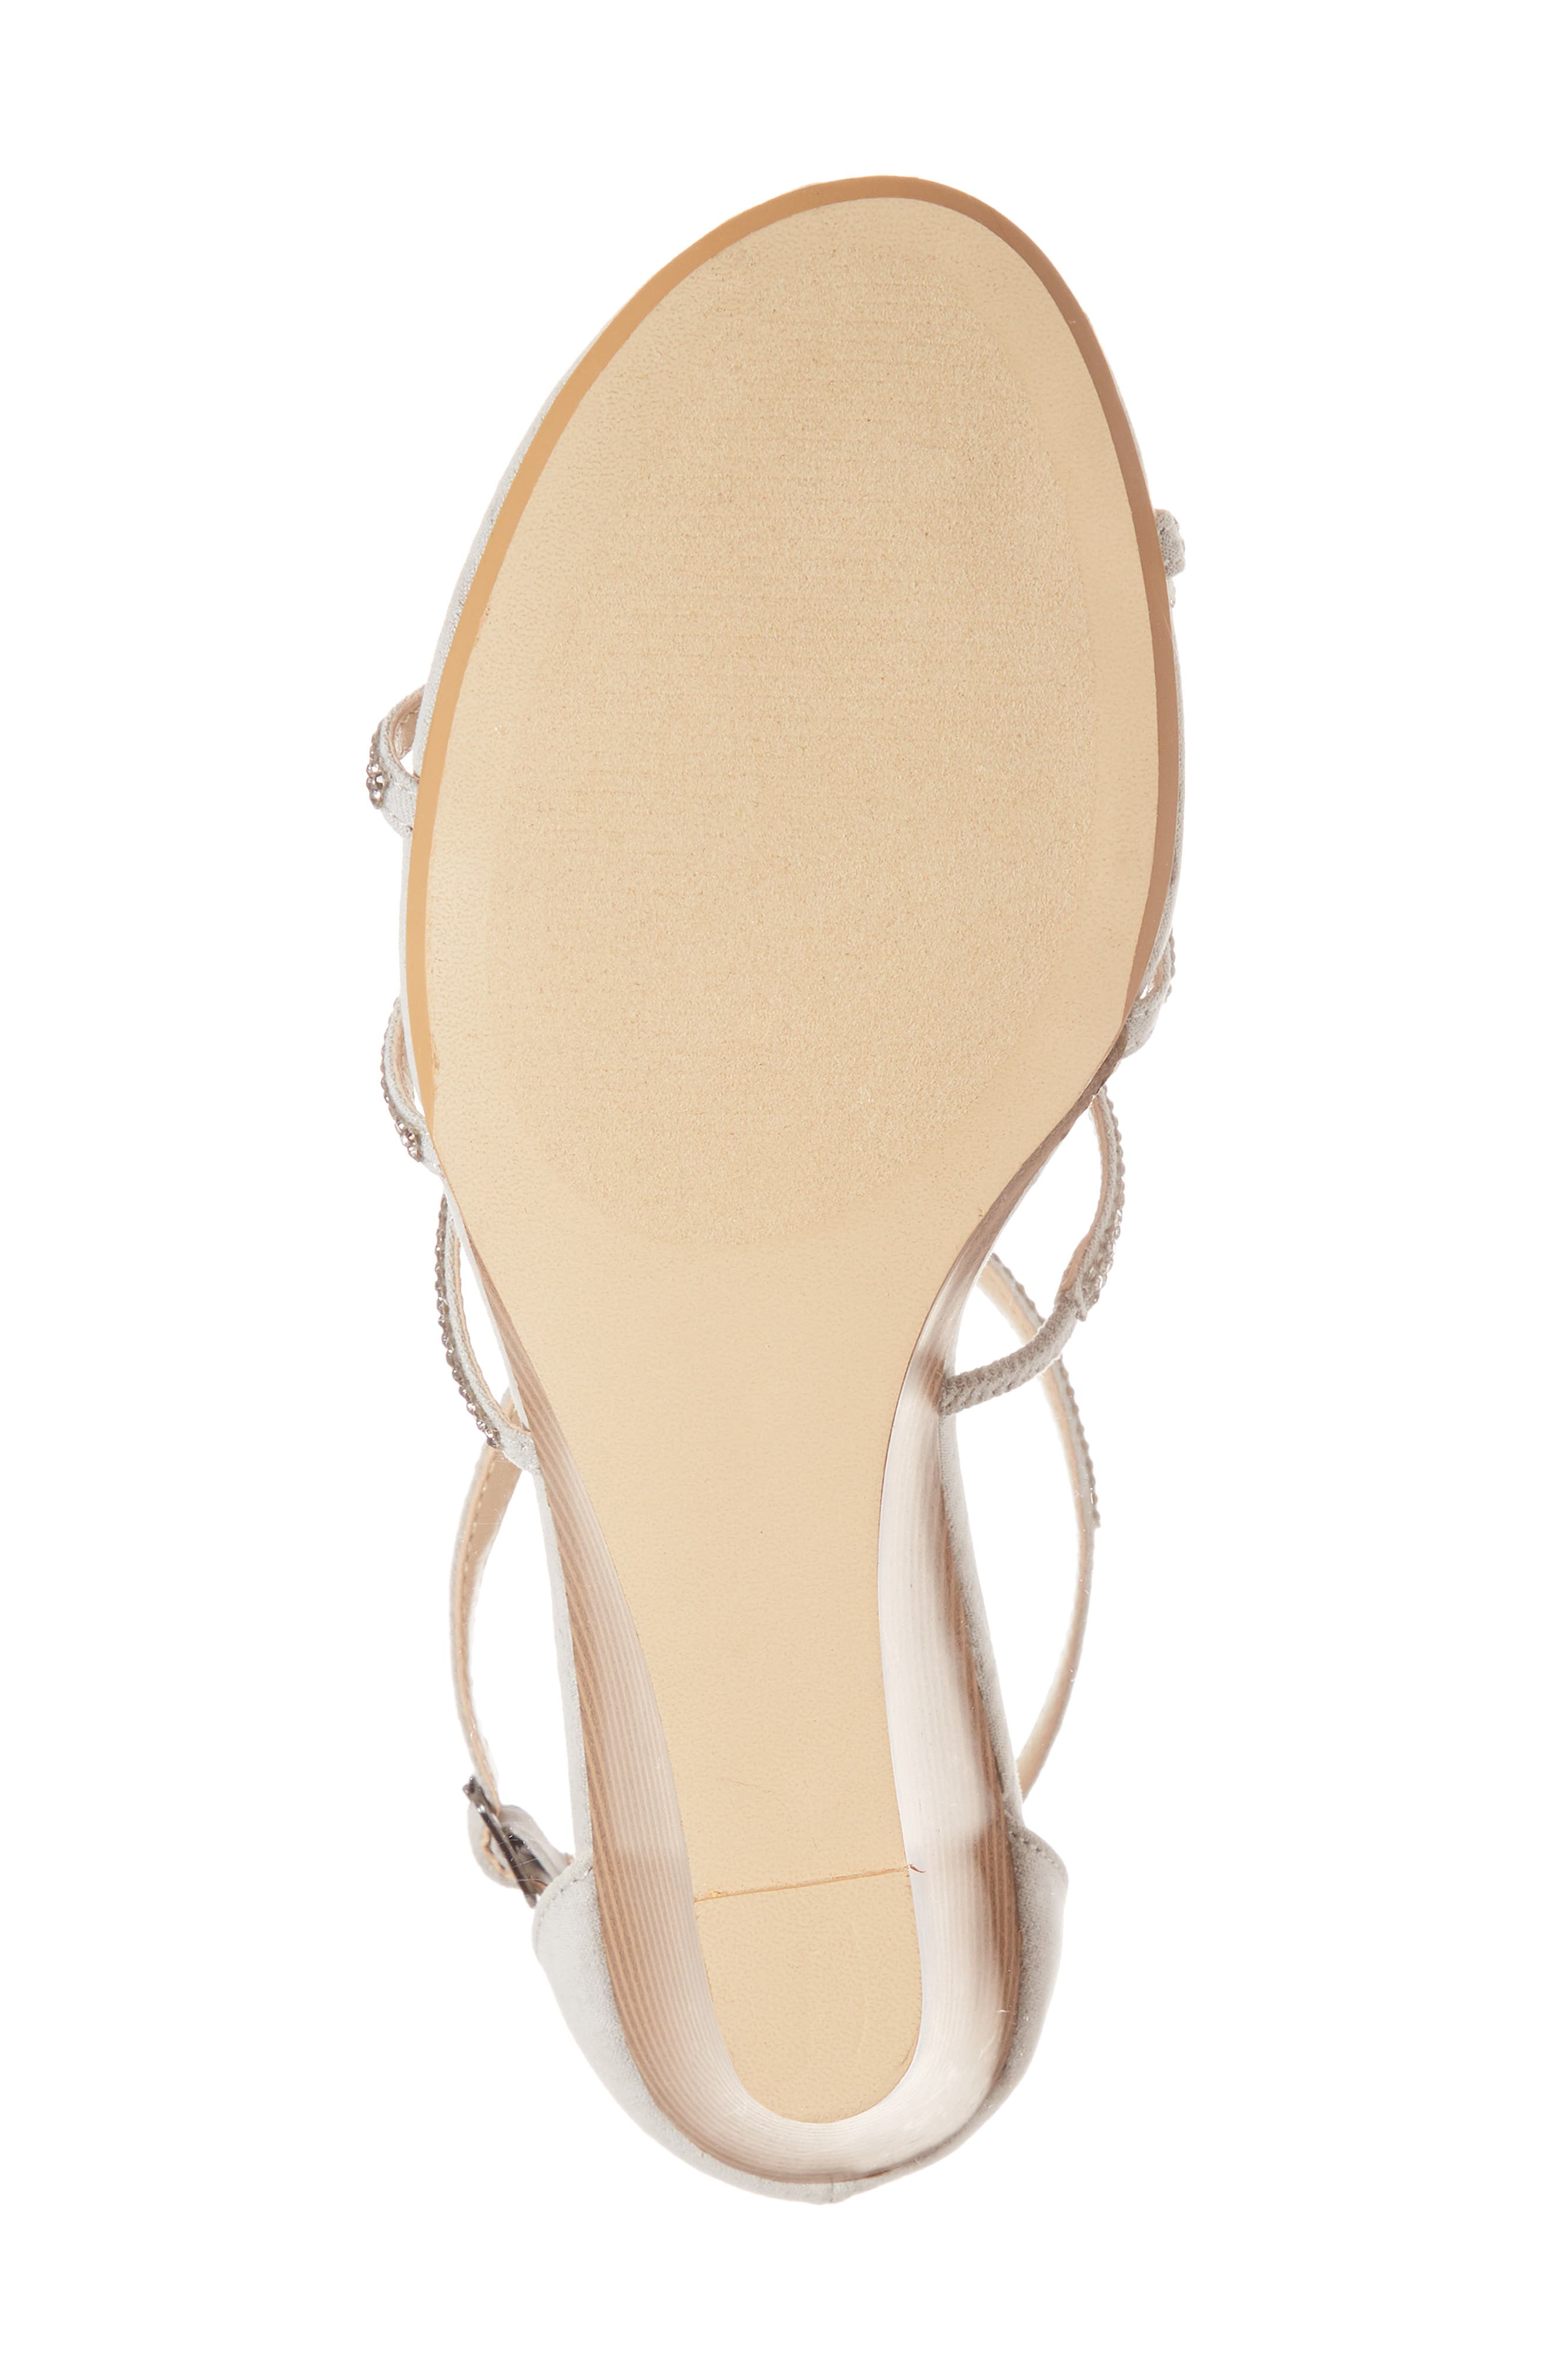 Hampton Crystal Embellished Wedge Sandal,                             Alternate thumbnail 6, color,                             Grey Suede